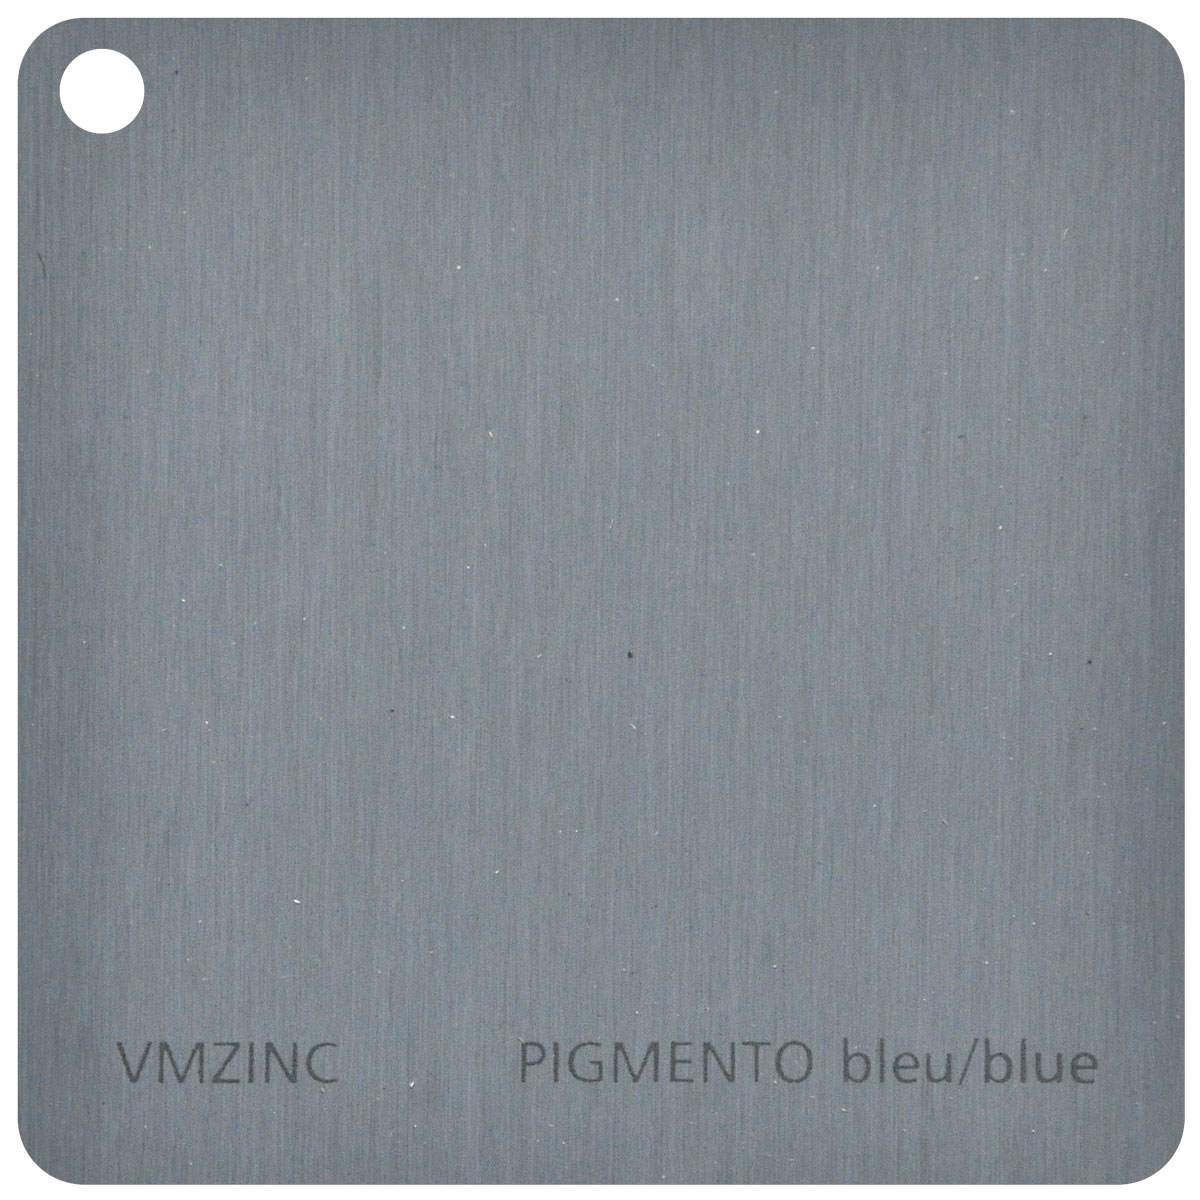 pigmento blue